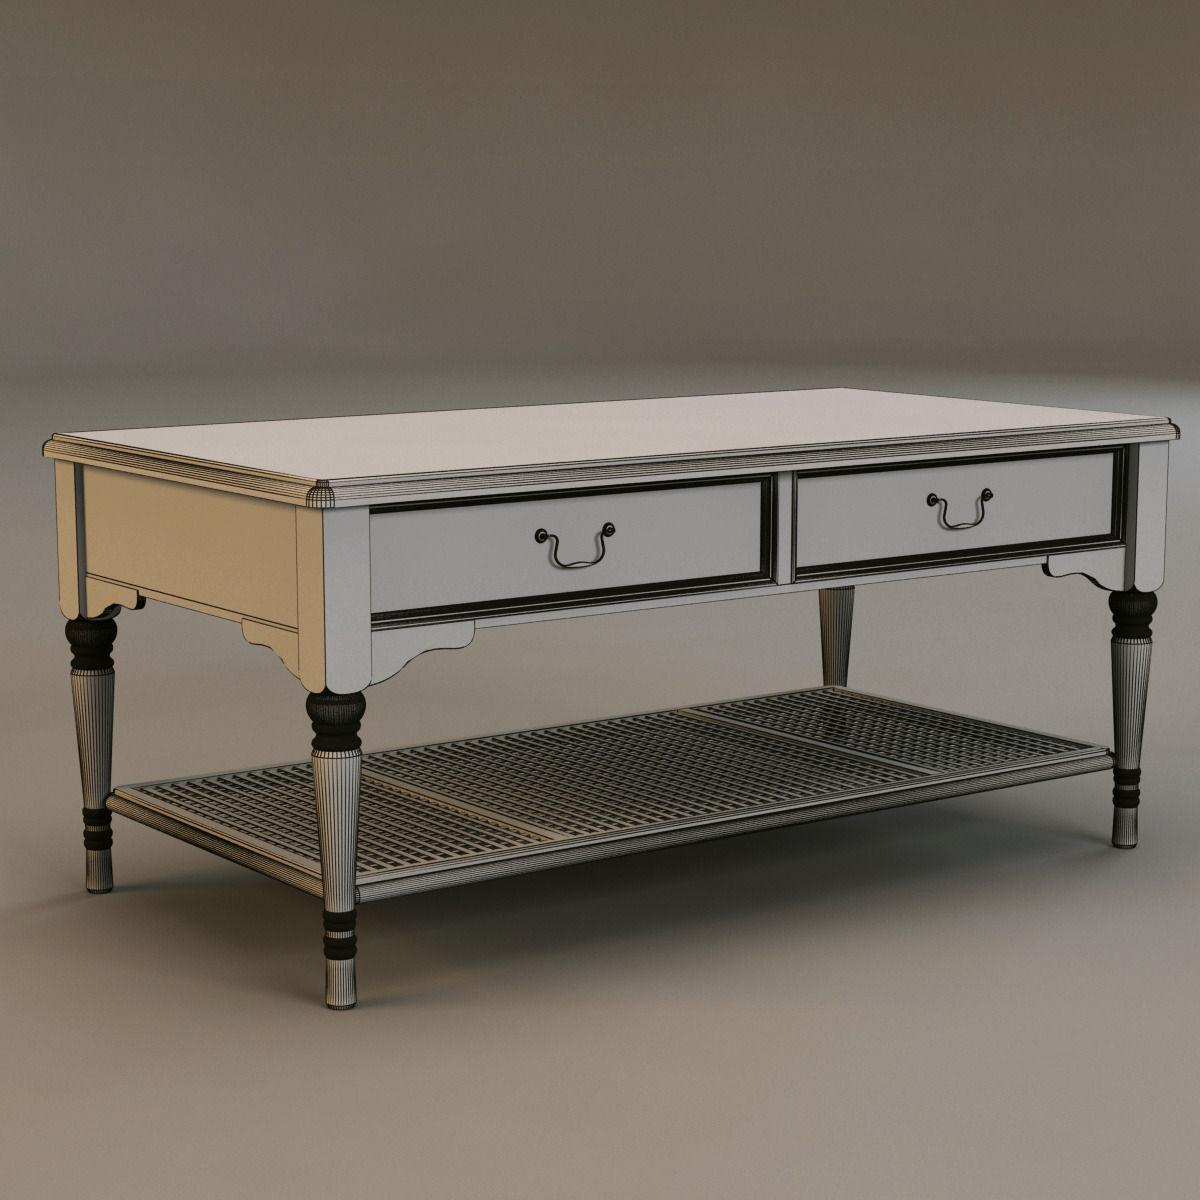 ... Laura Ashley Coffee Table 3d Model Max Obj 3ds Fbx Mtl 5